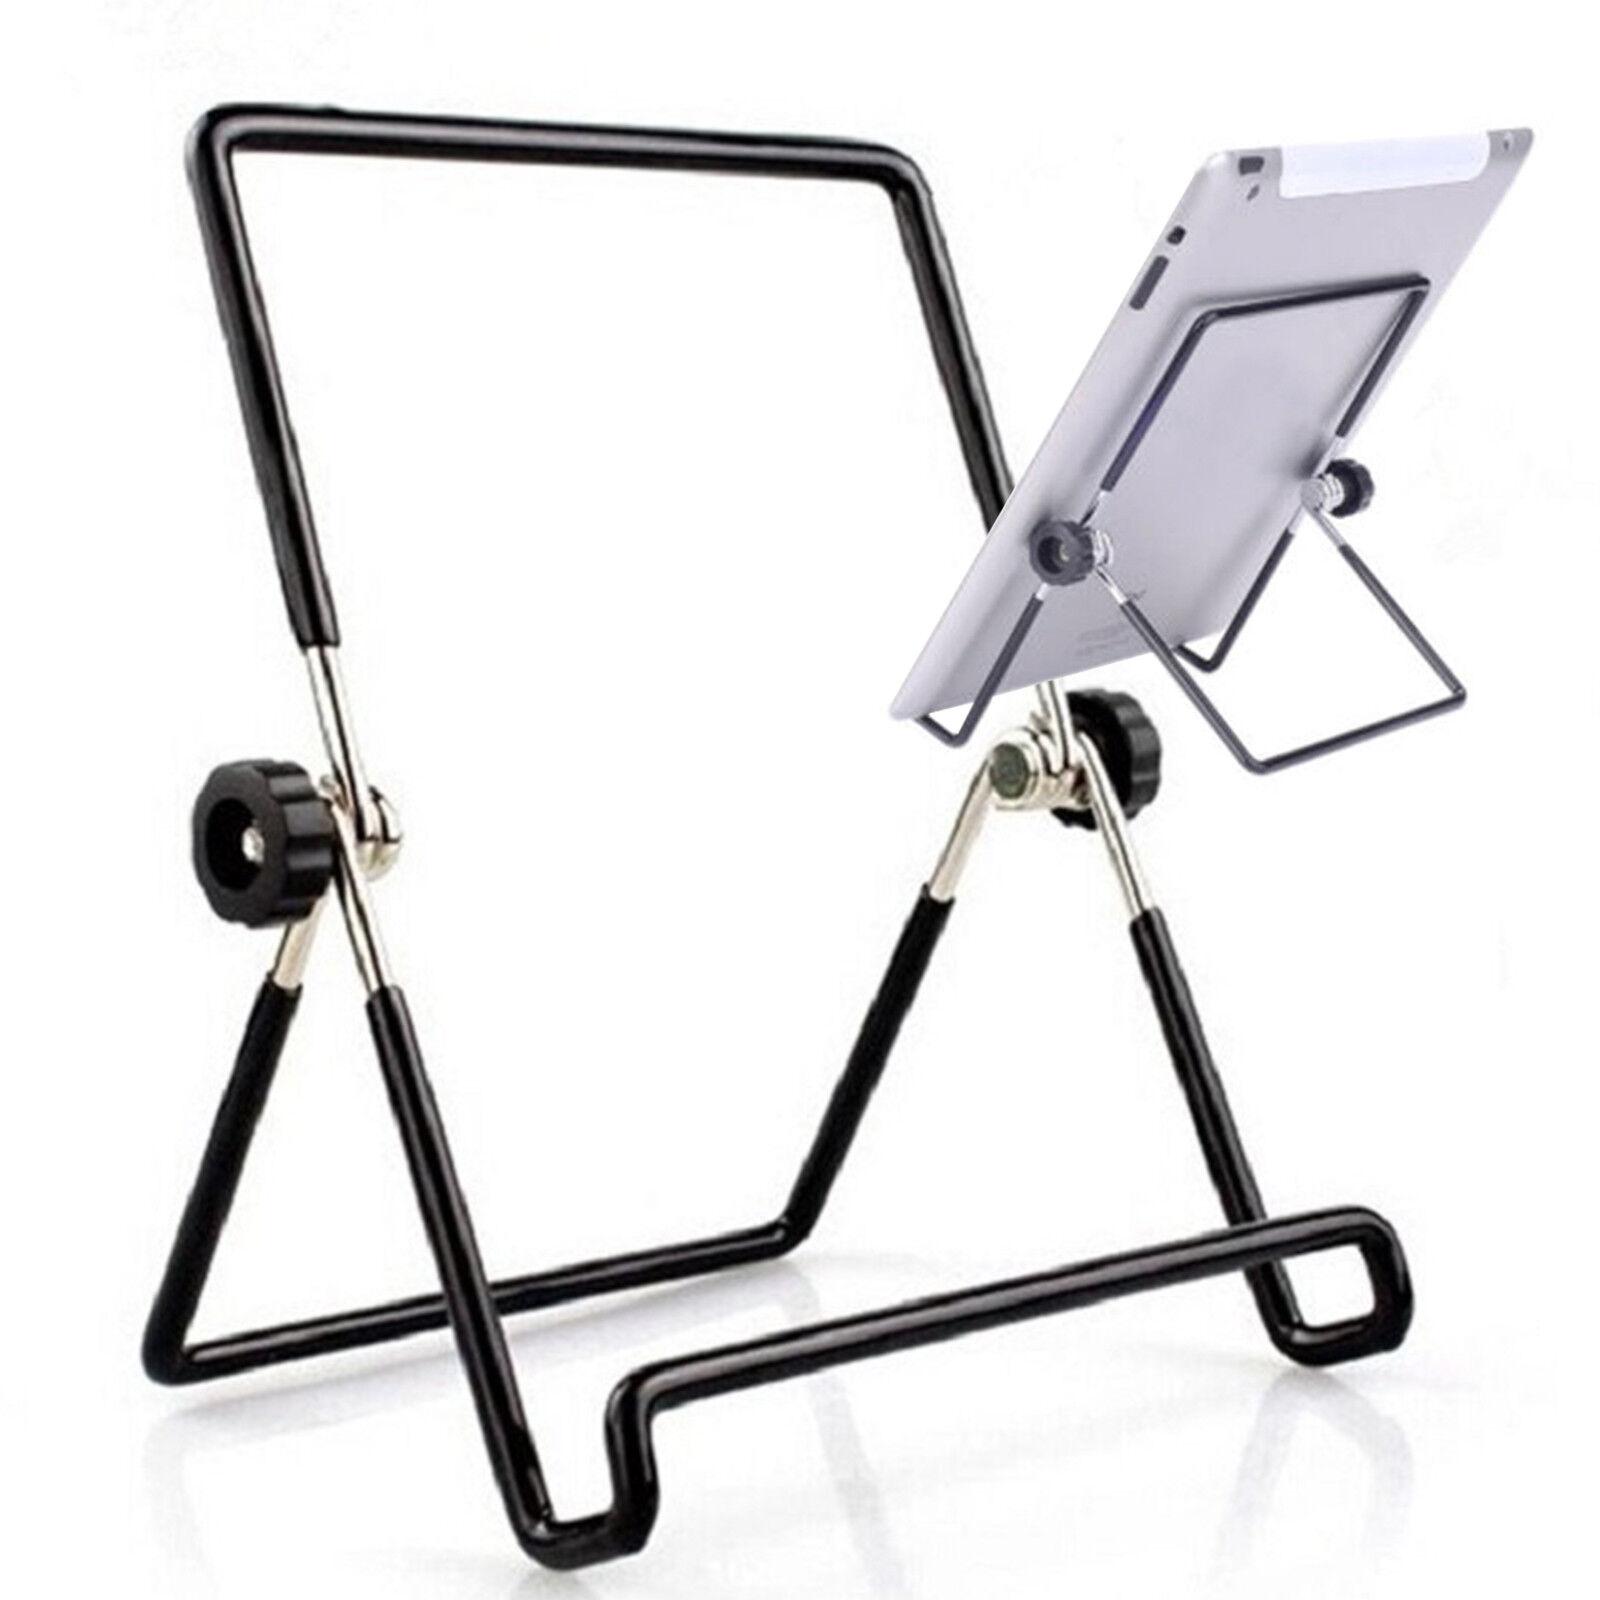 Adjustable Aluminum Multi-Angle Holder Stand Mount Ipad Tablet Book Read CQ1864